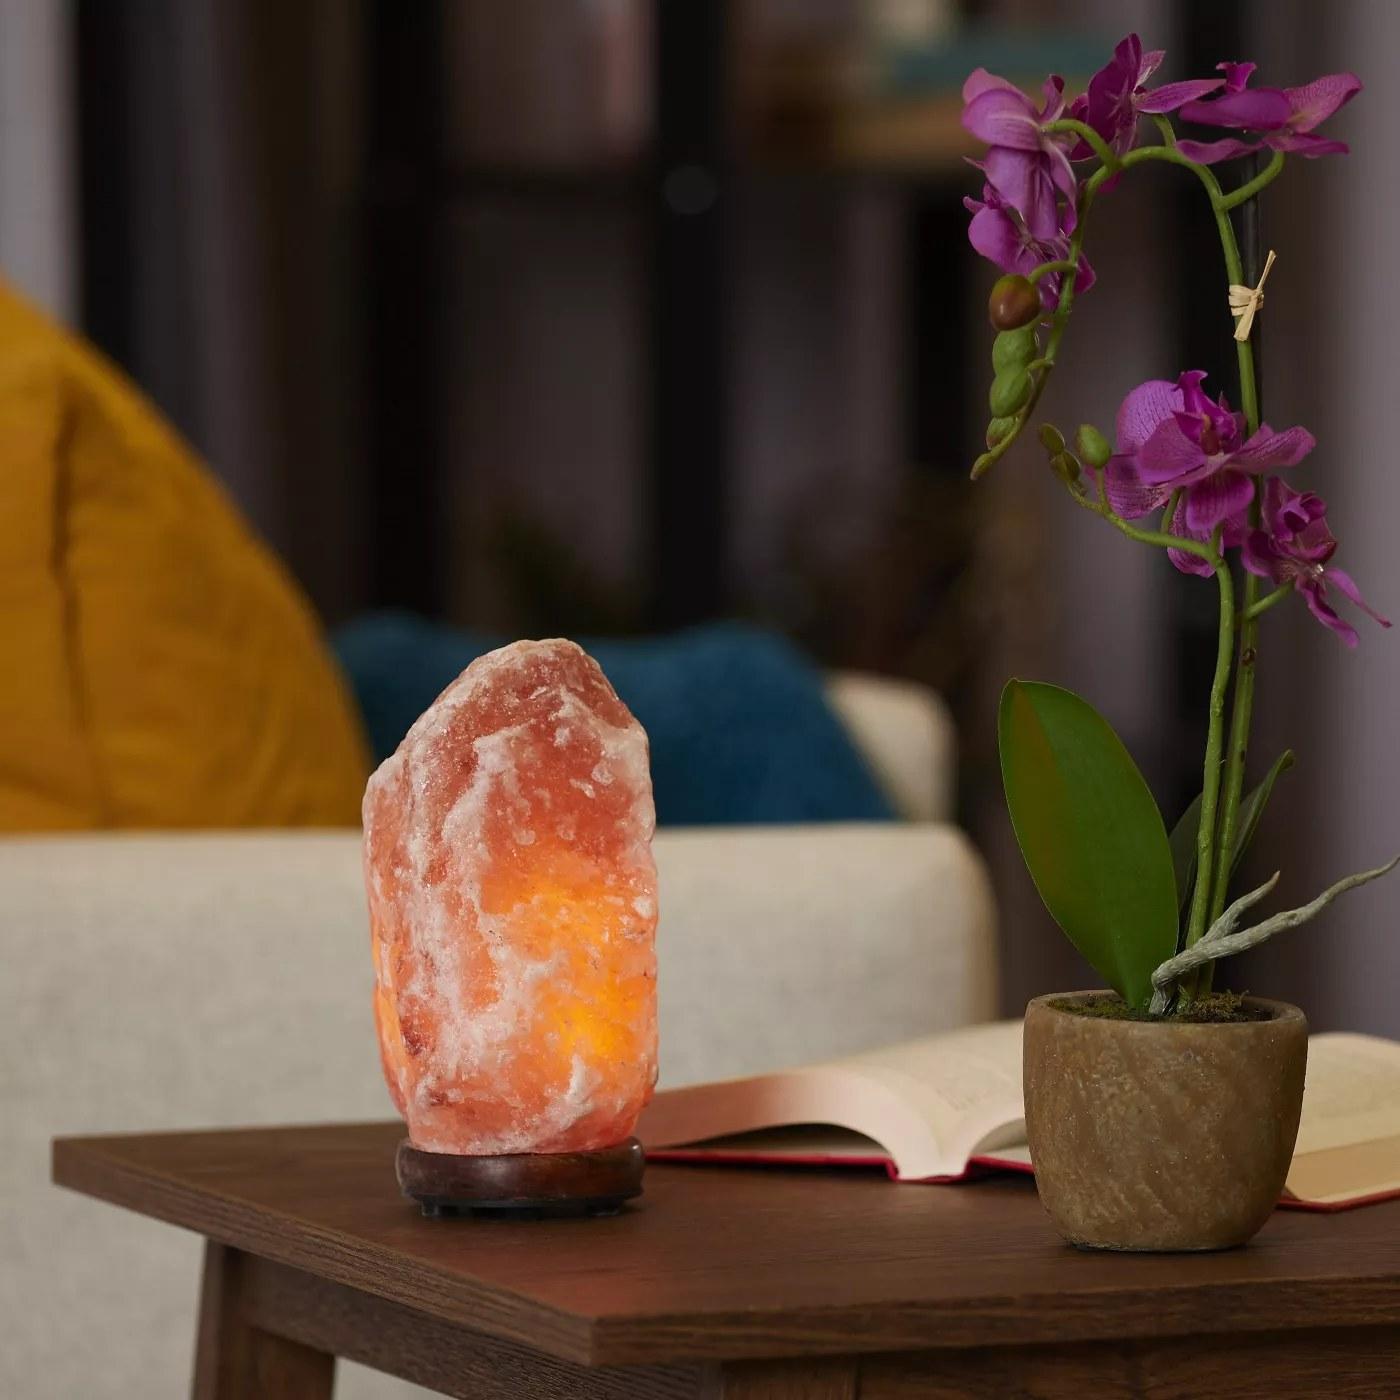 The salt lamp